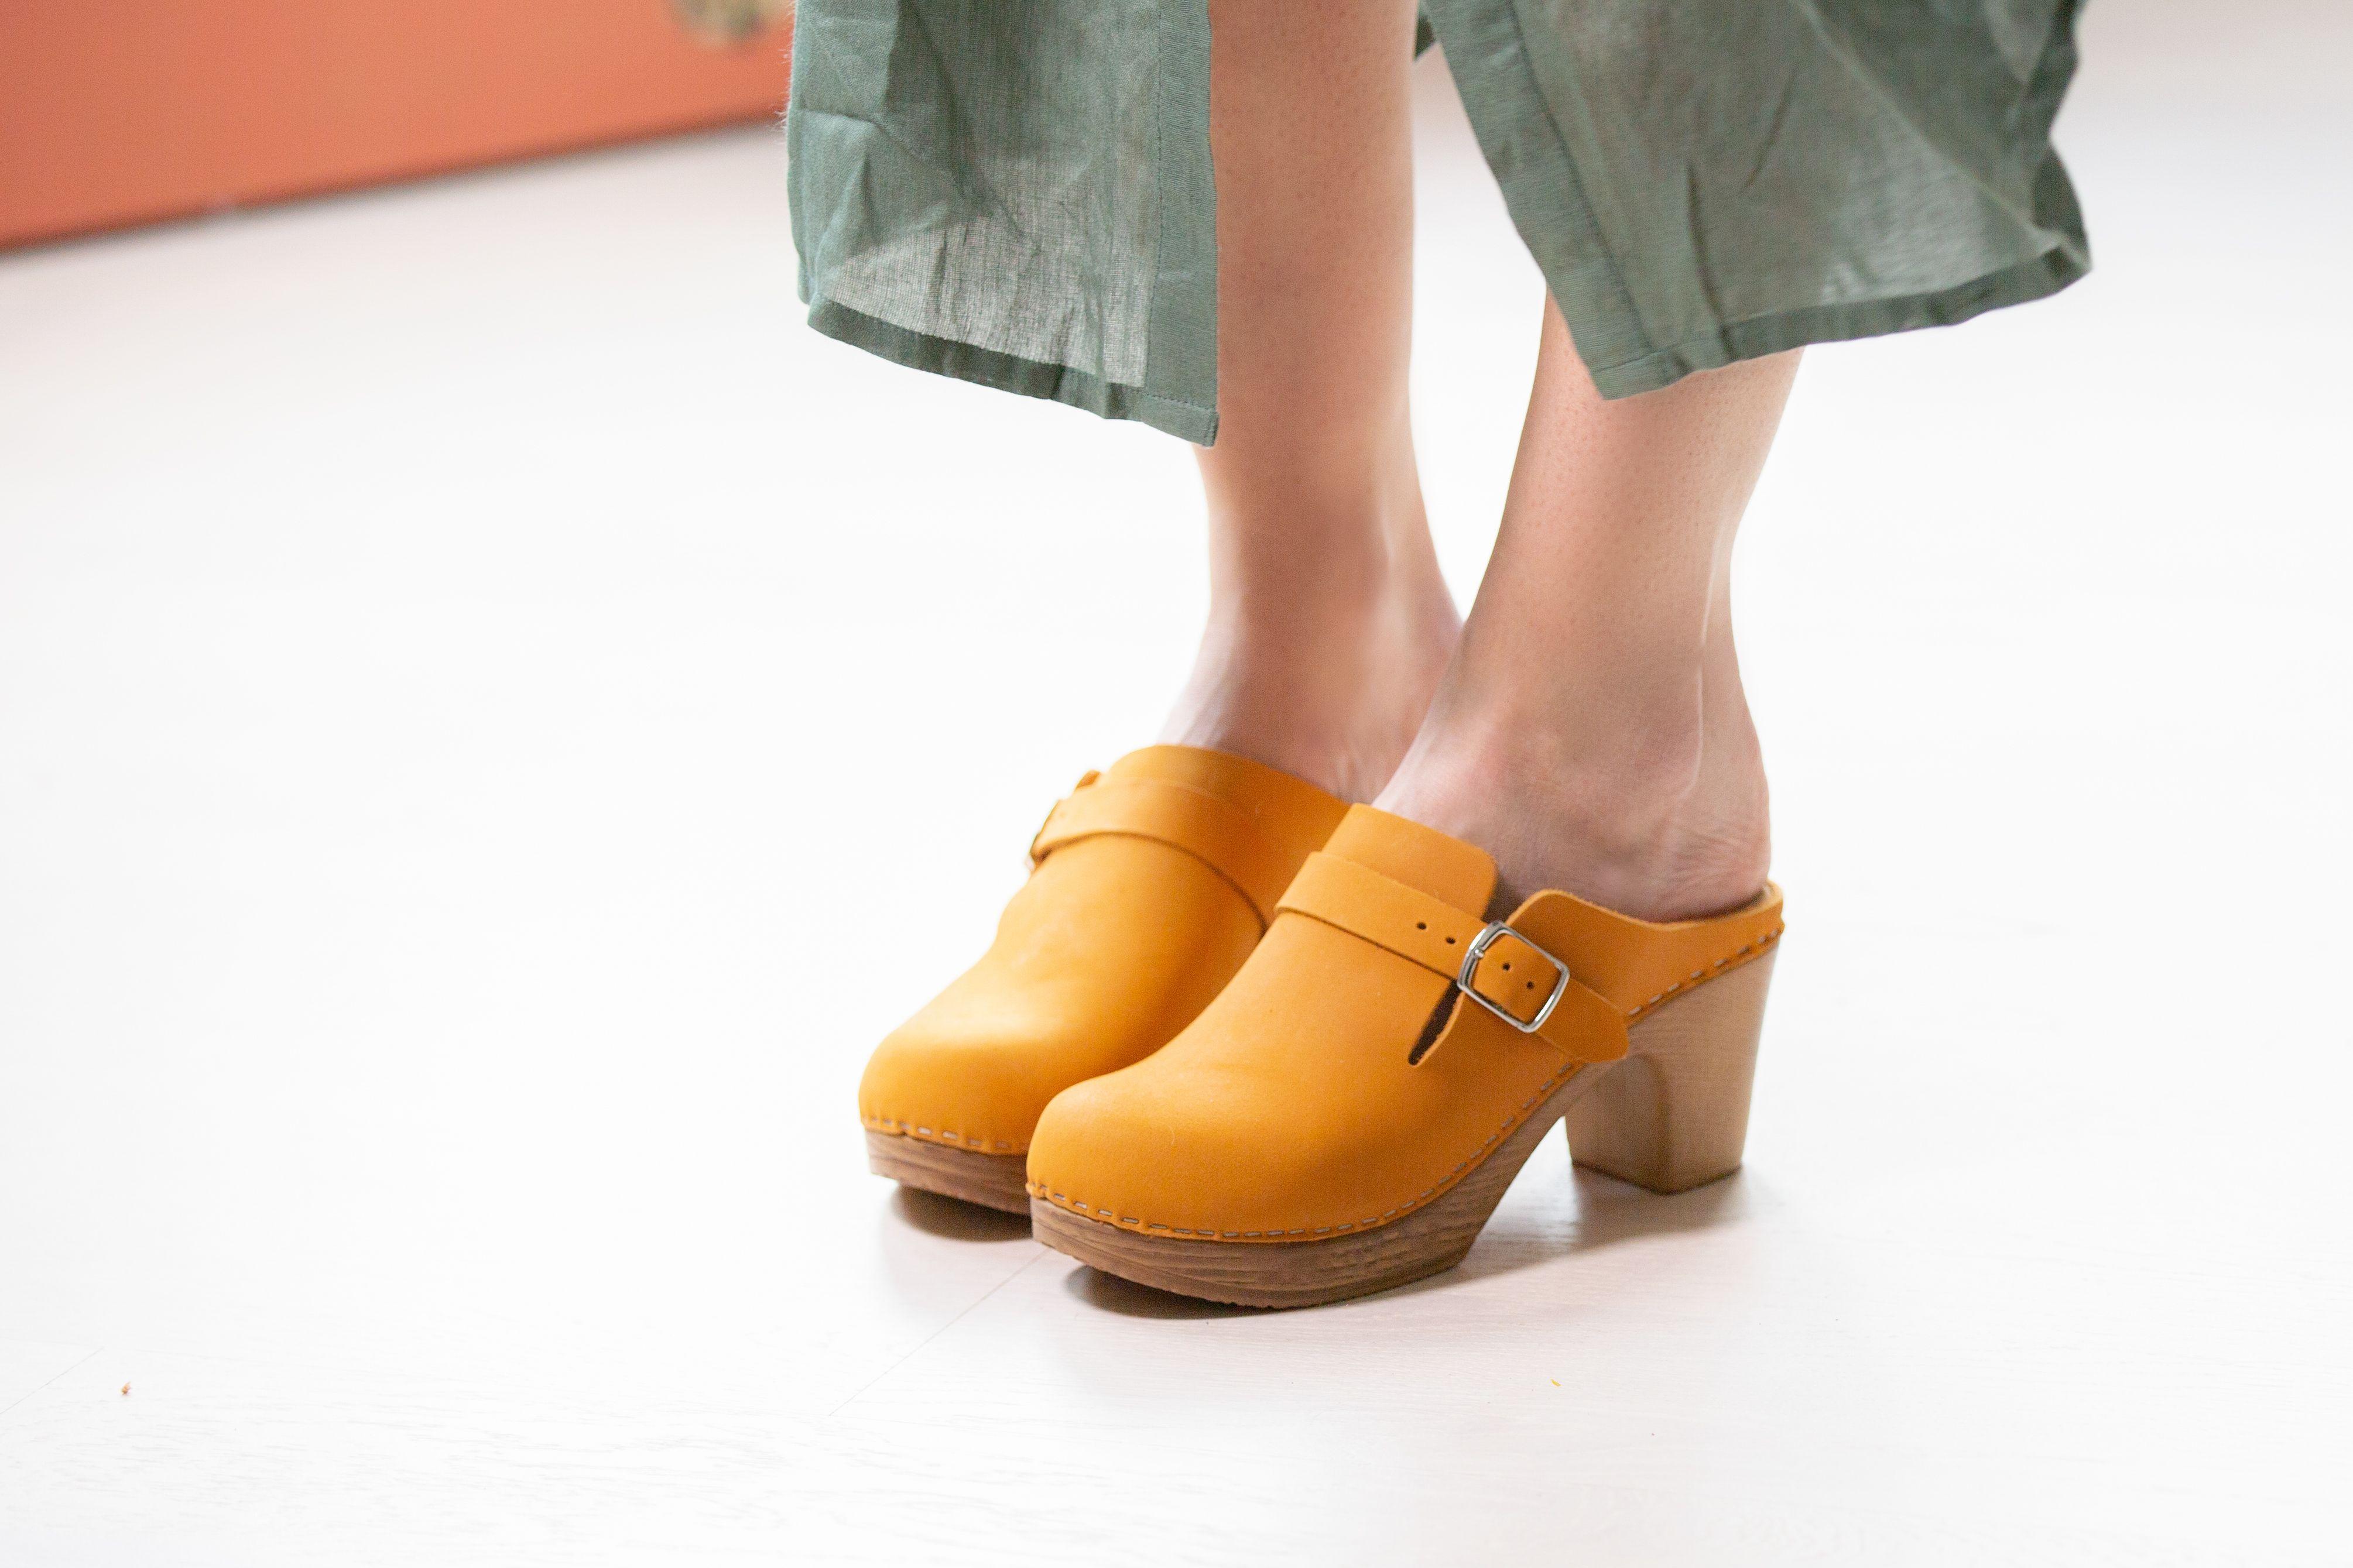 Calou Bianca Mustard | Clogs, Clog sandals, Shoes